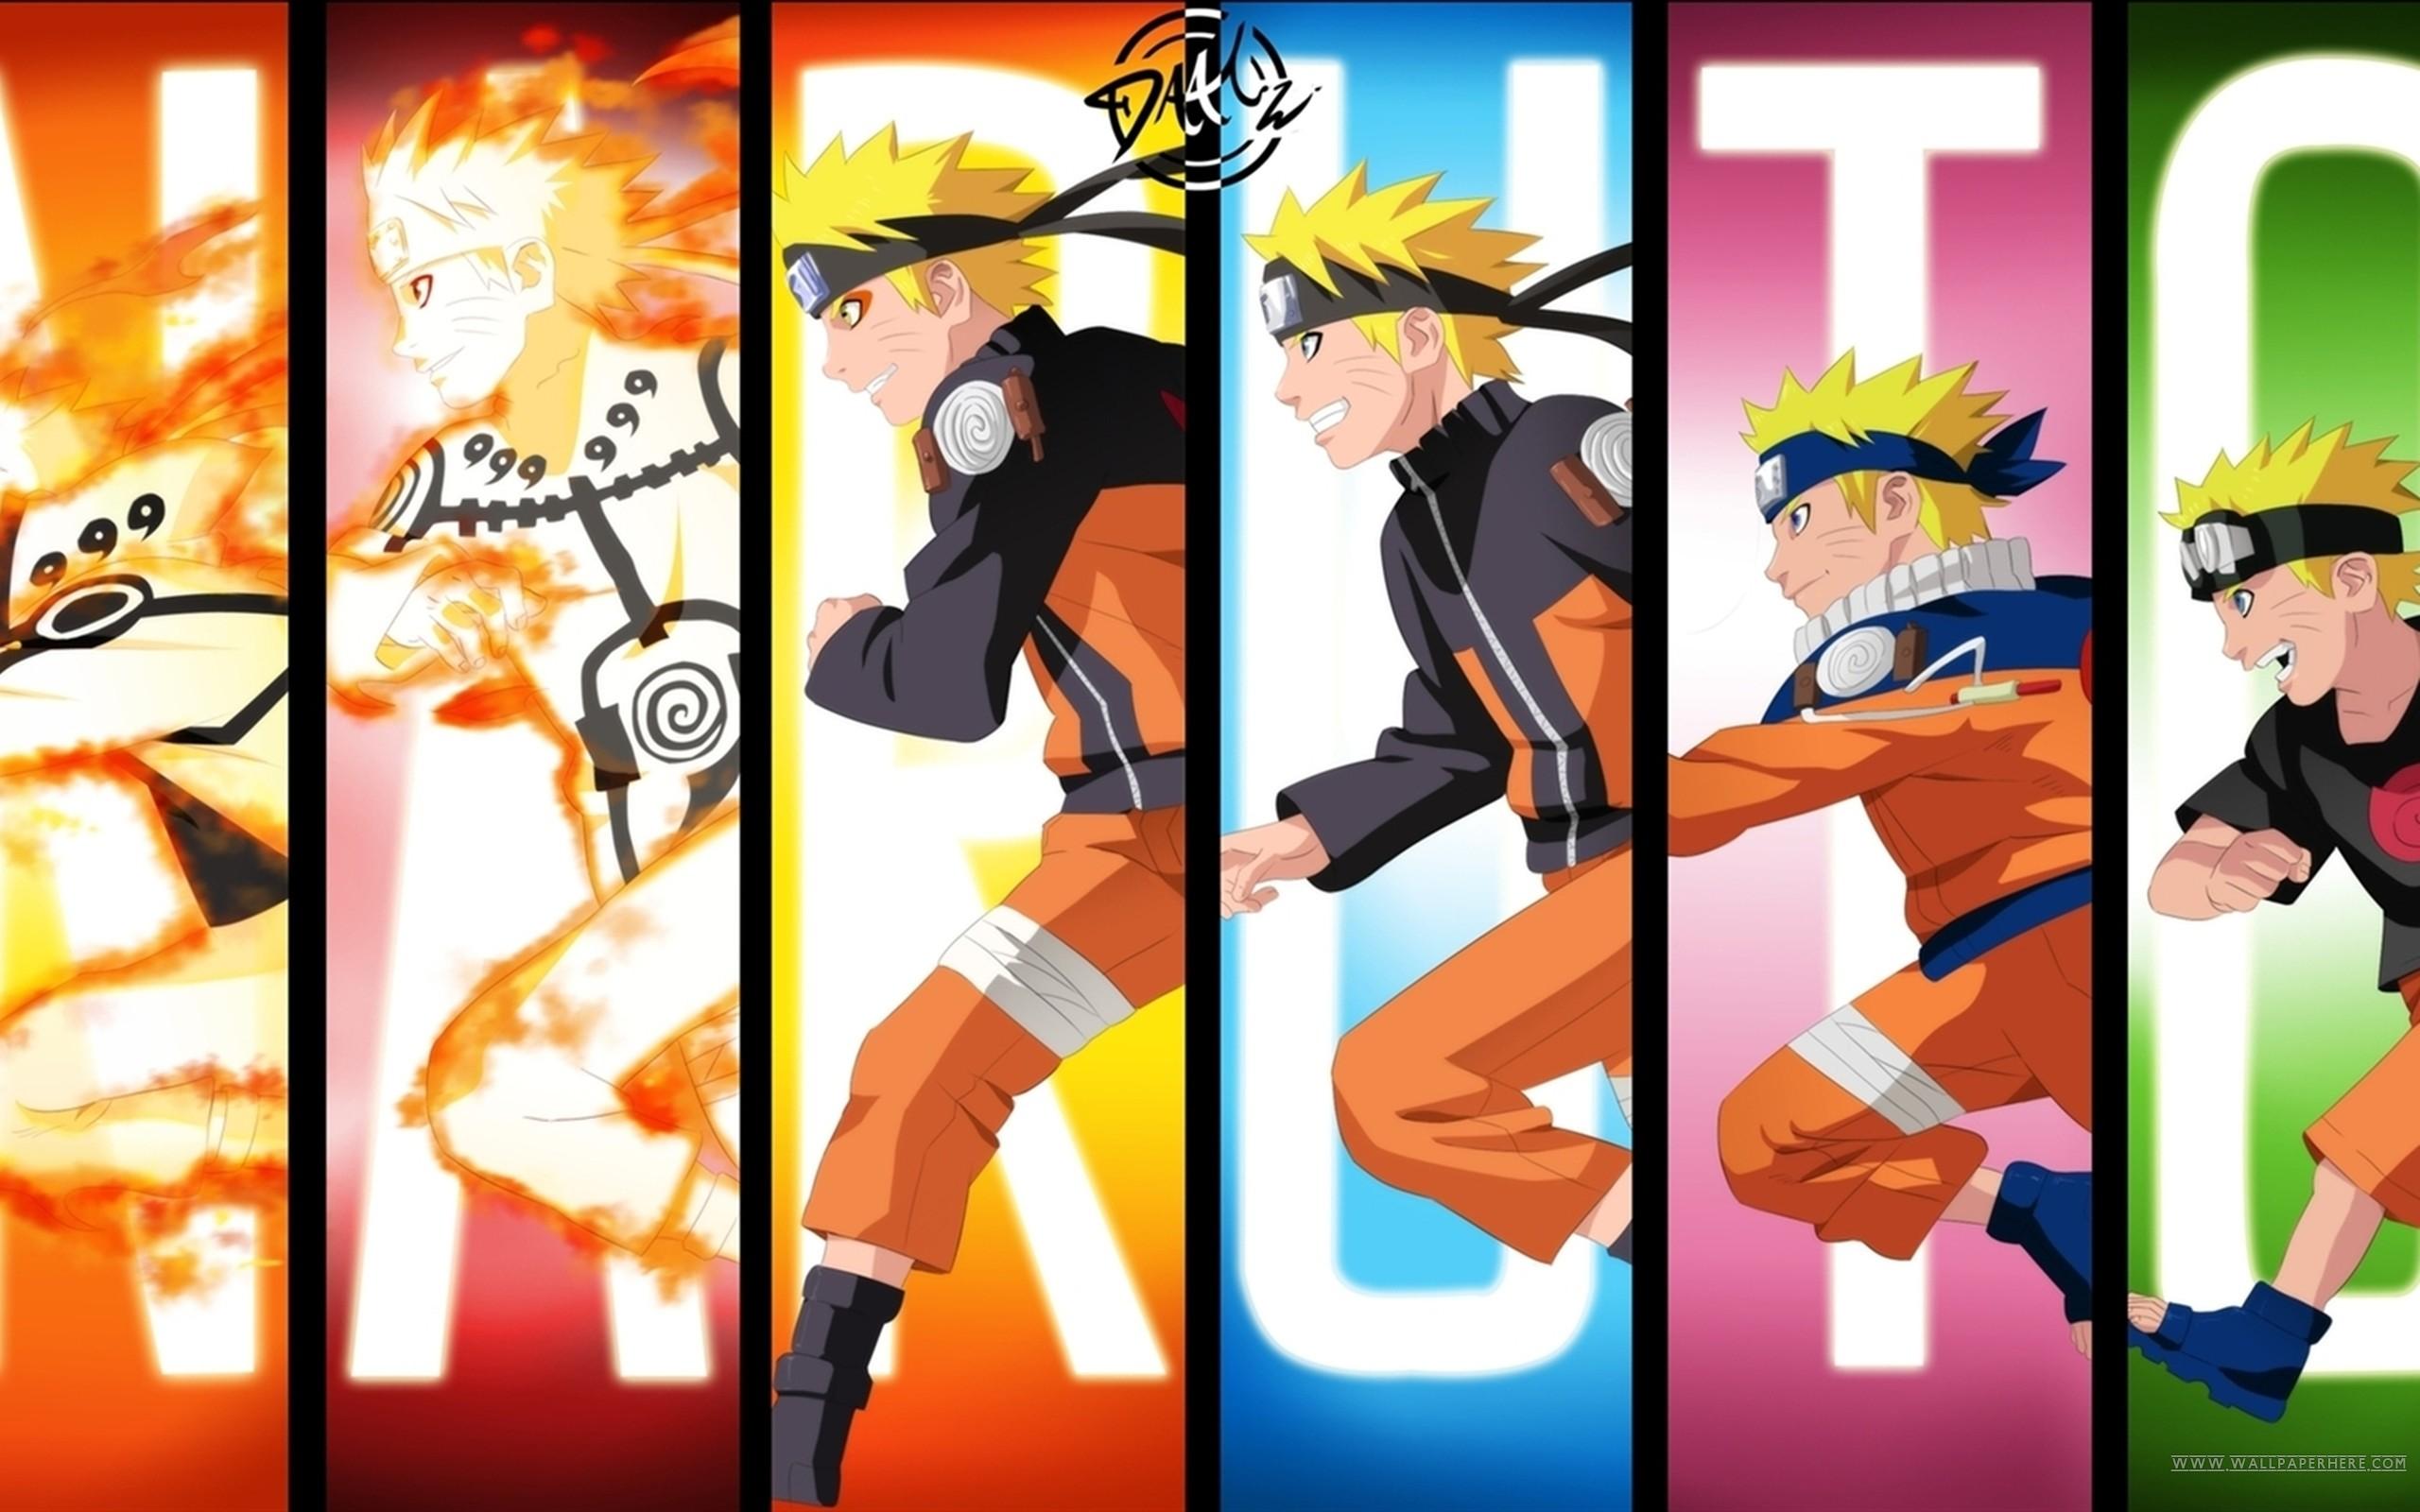 Wonderful Wallpaper Mac Naruto - 931527-gorgerous-naruto-characters-wallpapers-2560x1600-mac  HD_646688.jpg